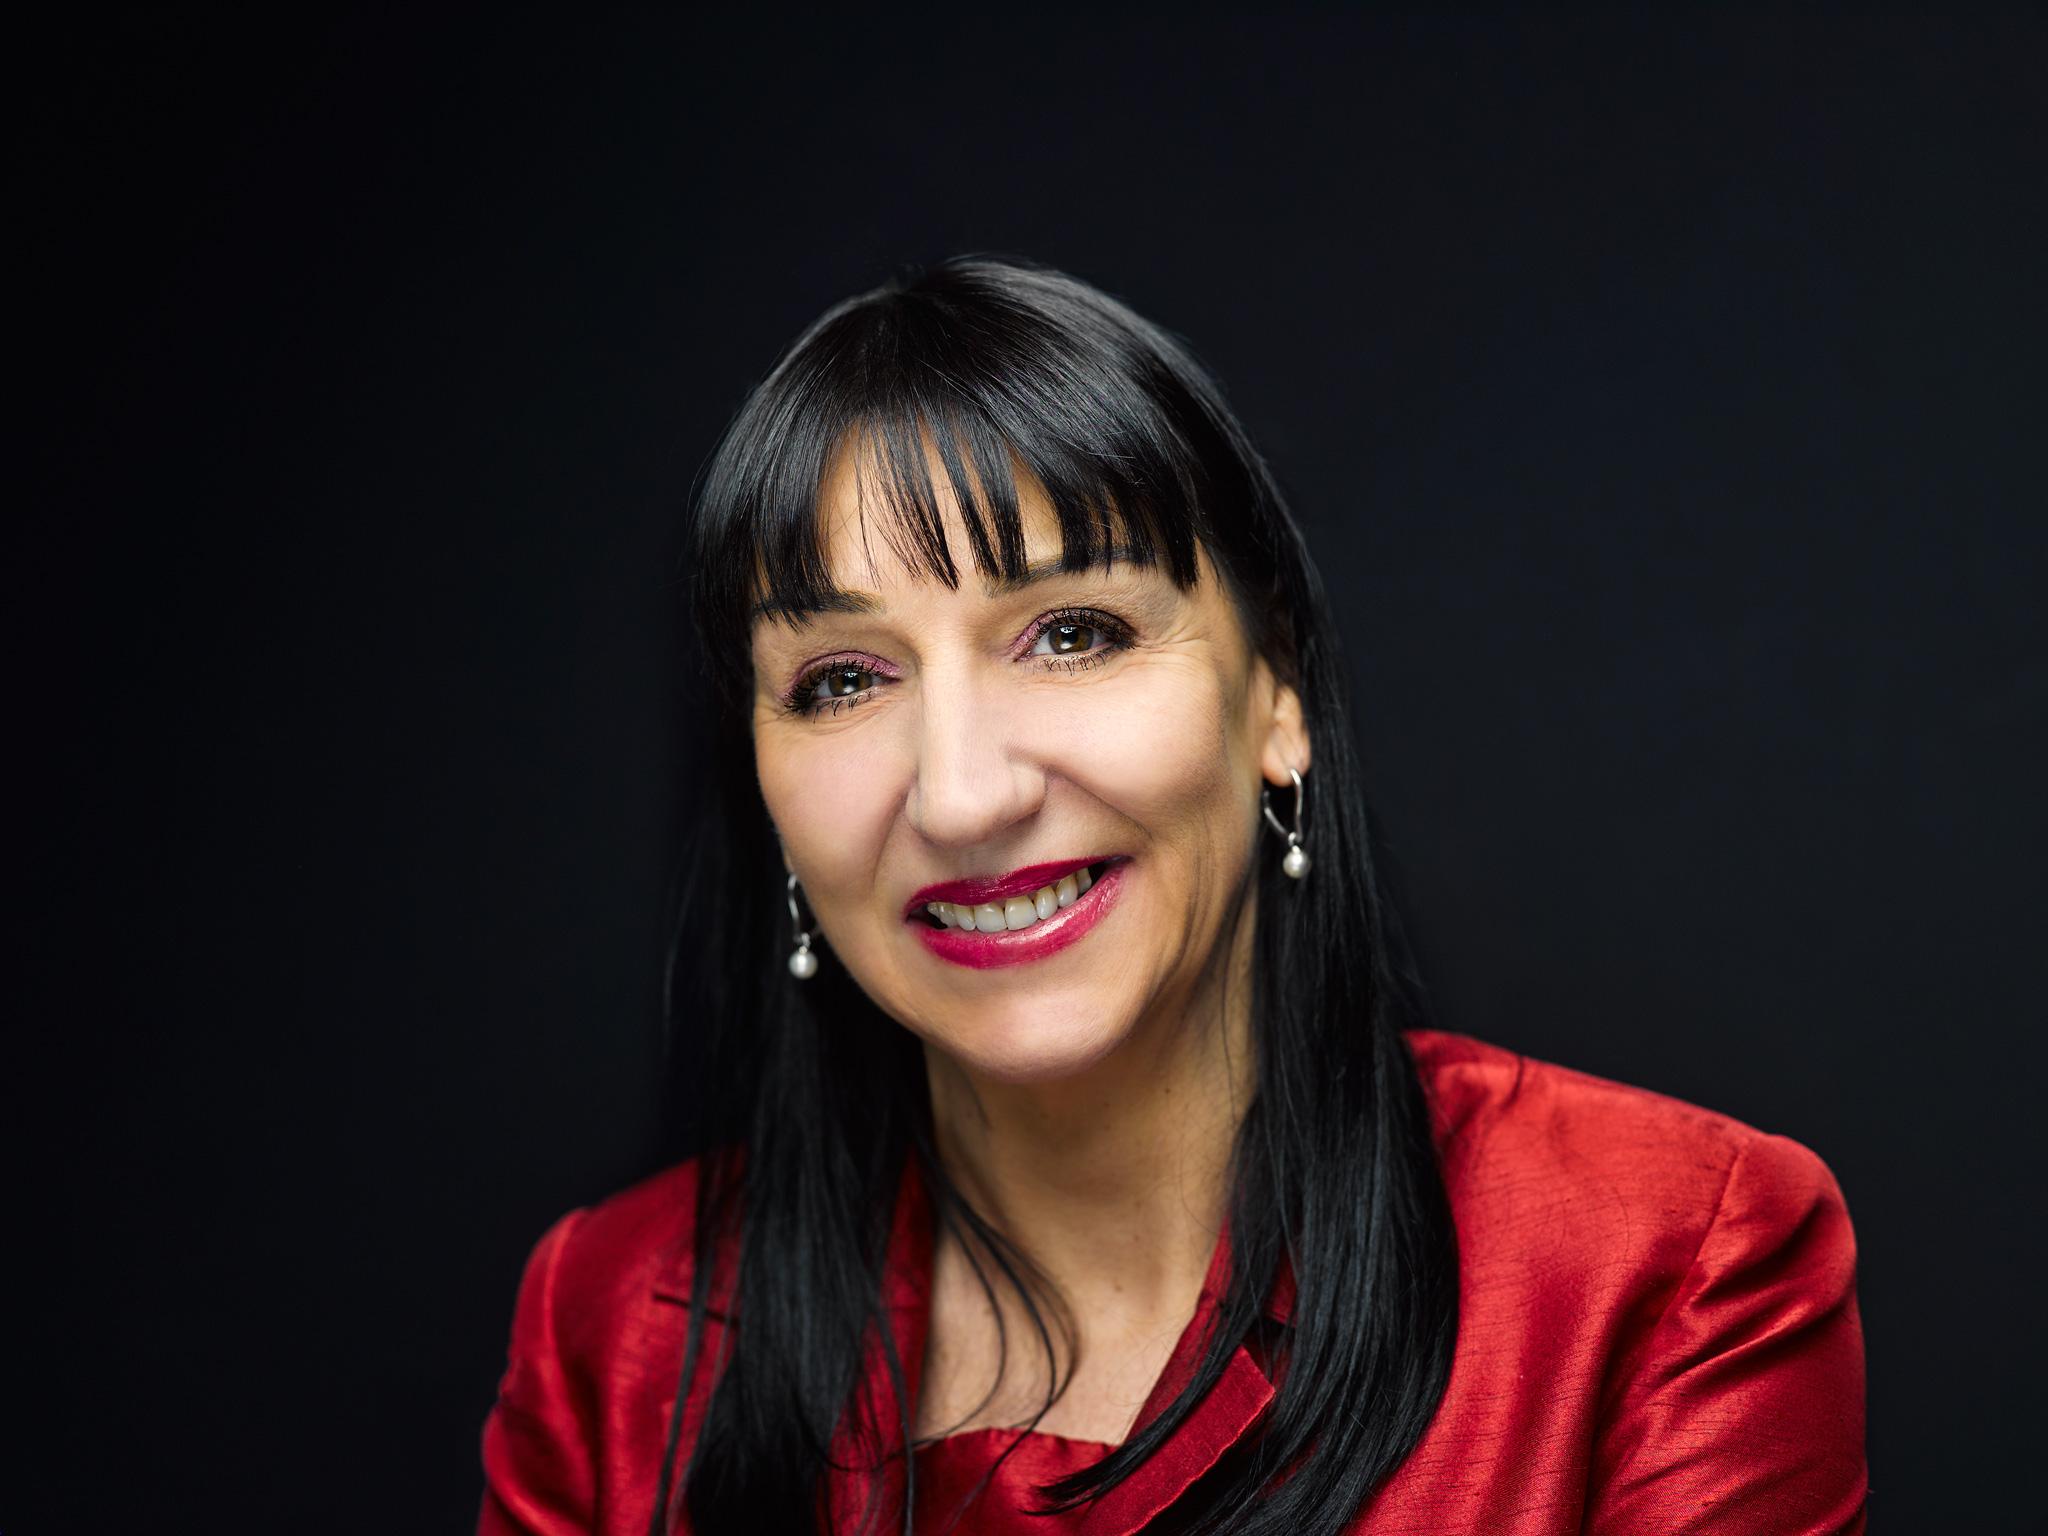 Catherine Stuhlmann